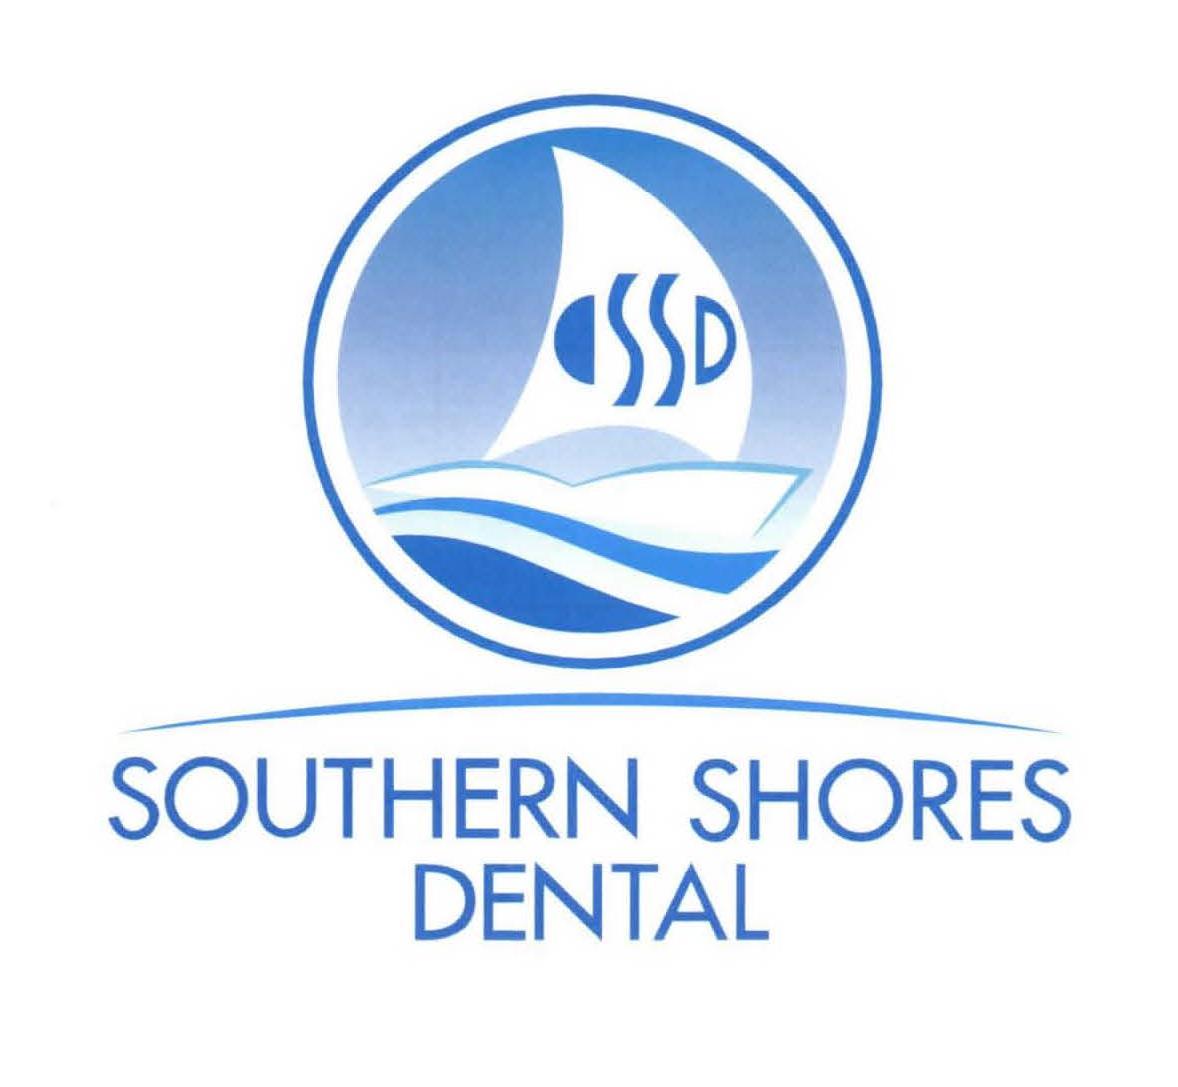 Southern Shores Dental